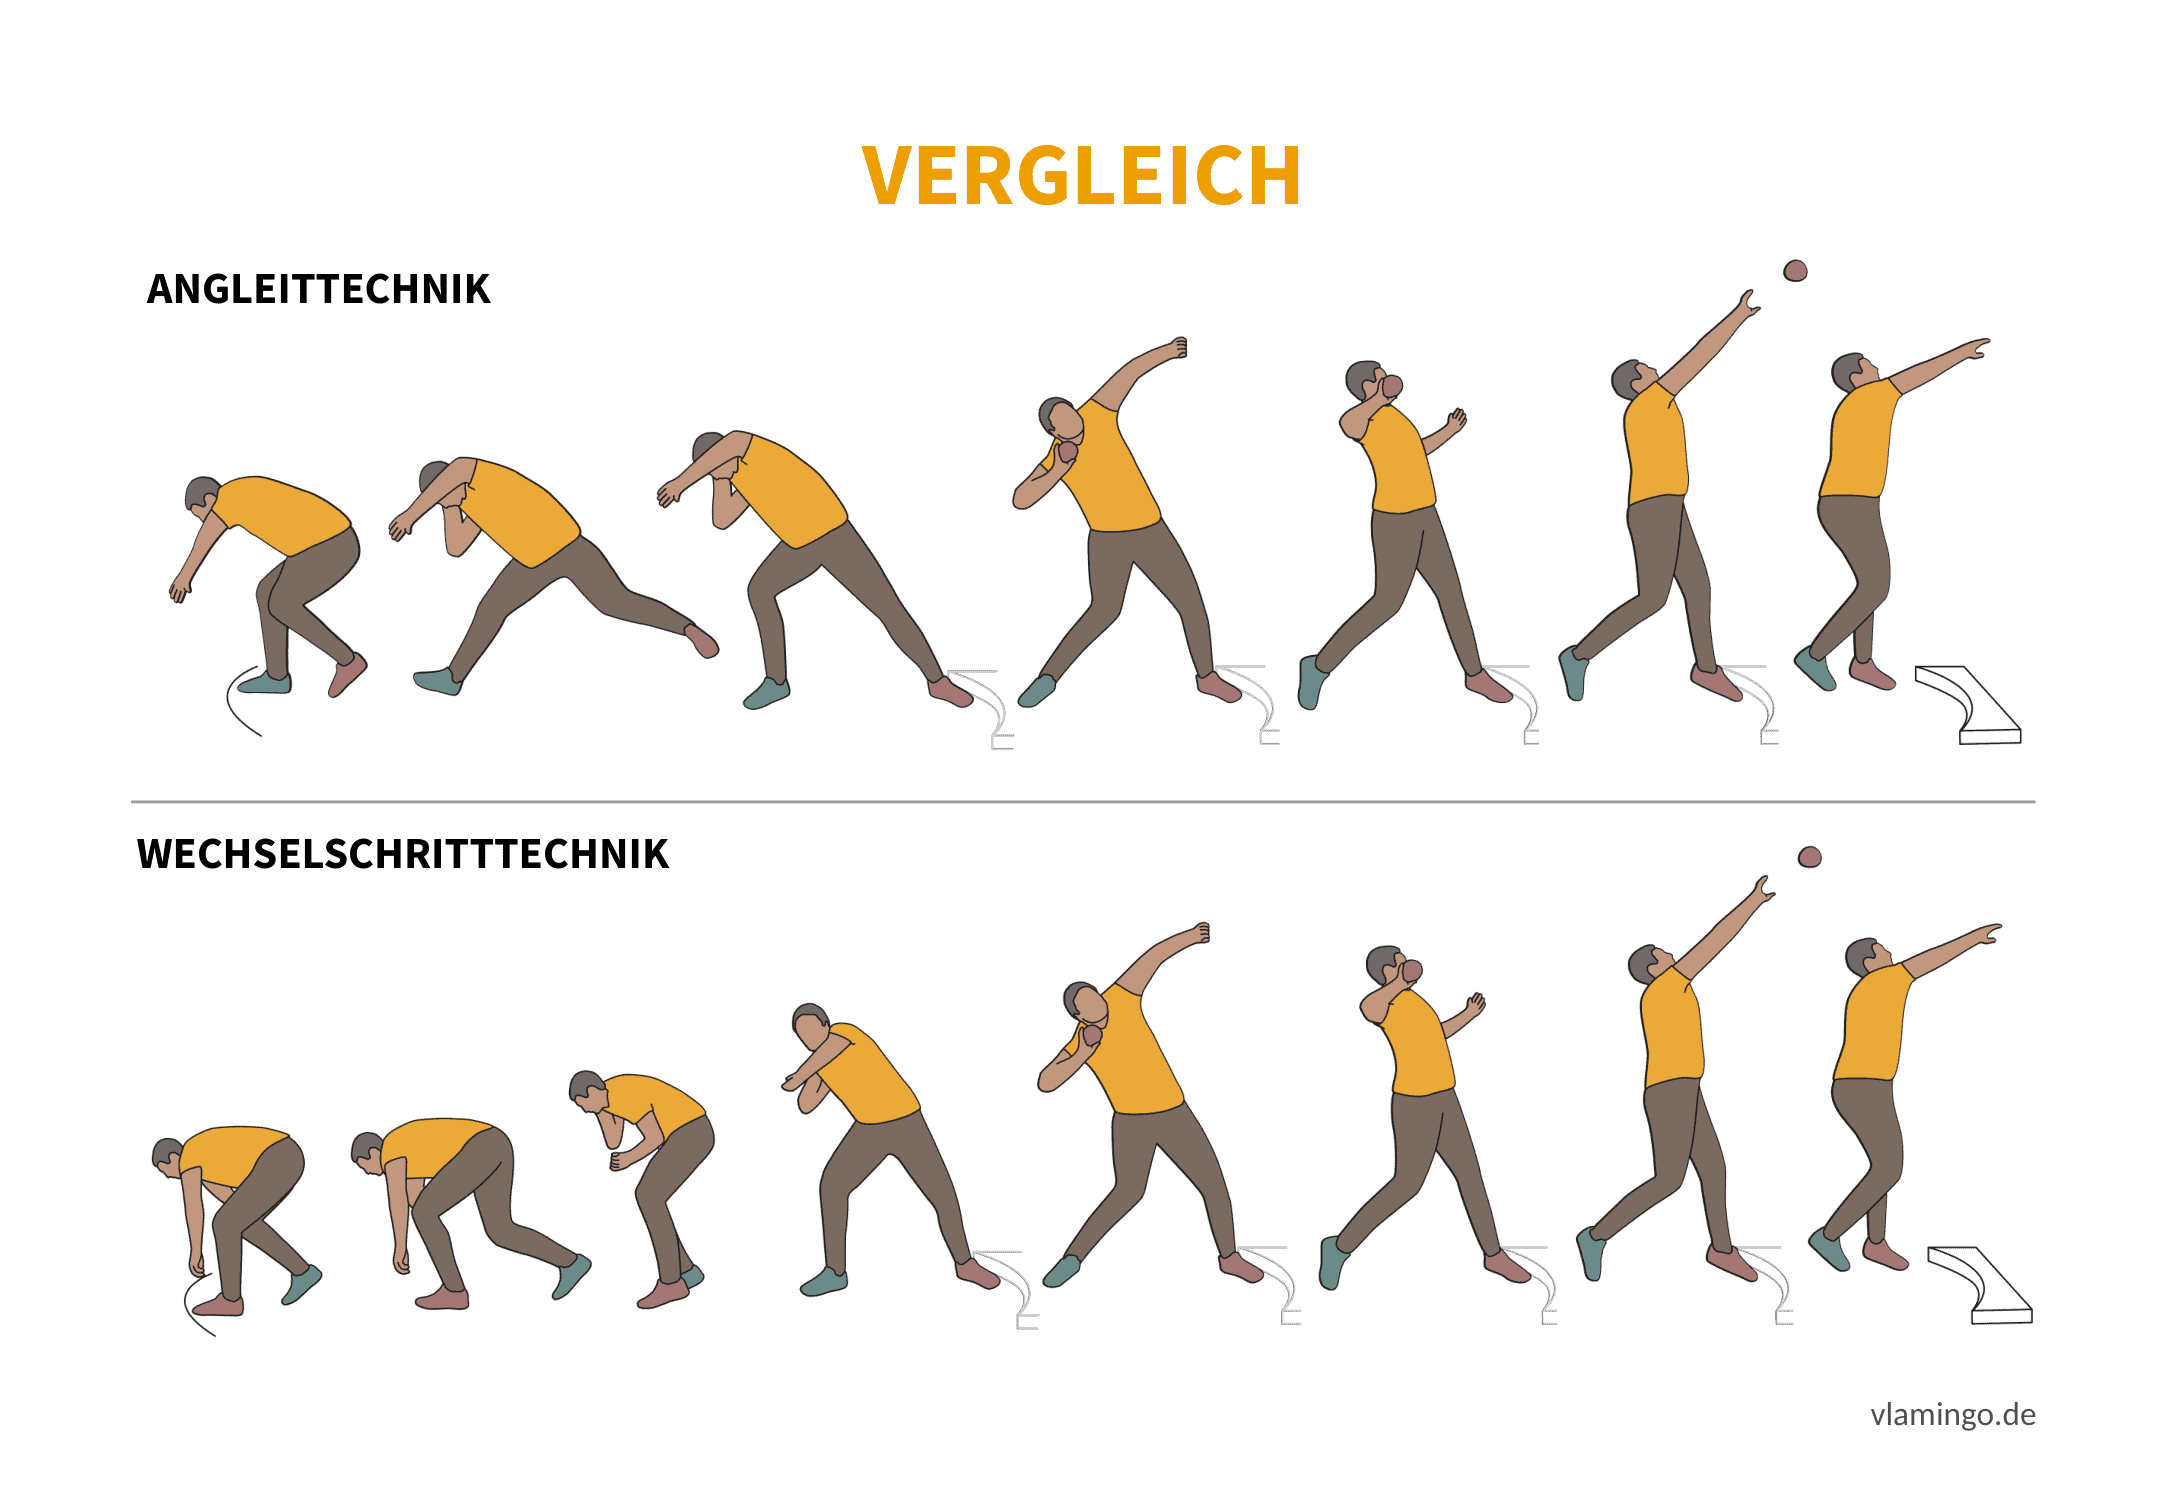 Angleittechnik vs Wechselstoßtechnik (Bewegungsanalyse) - Leichtathletik